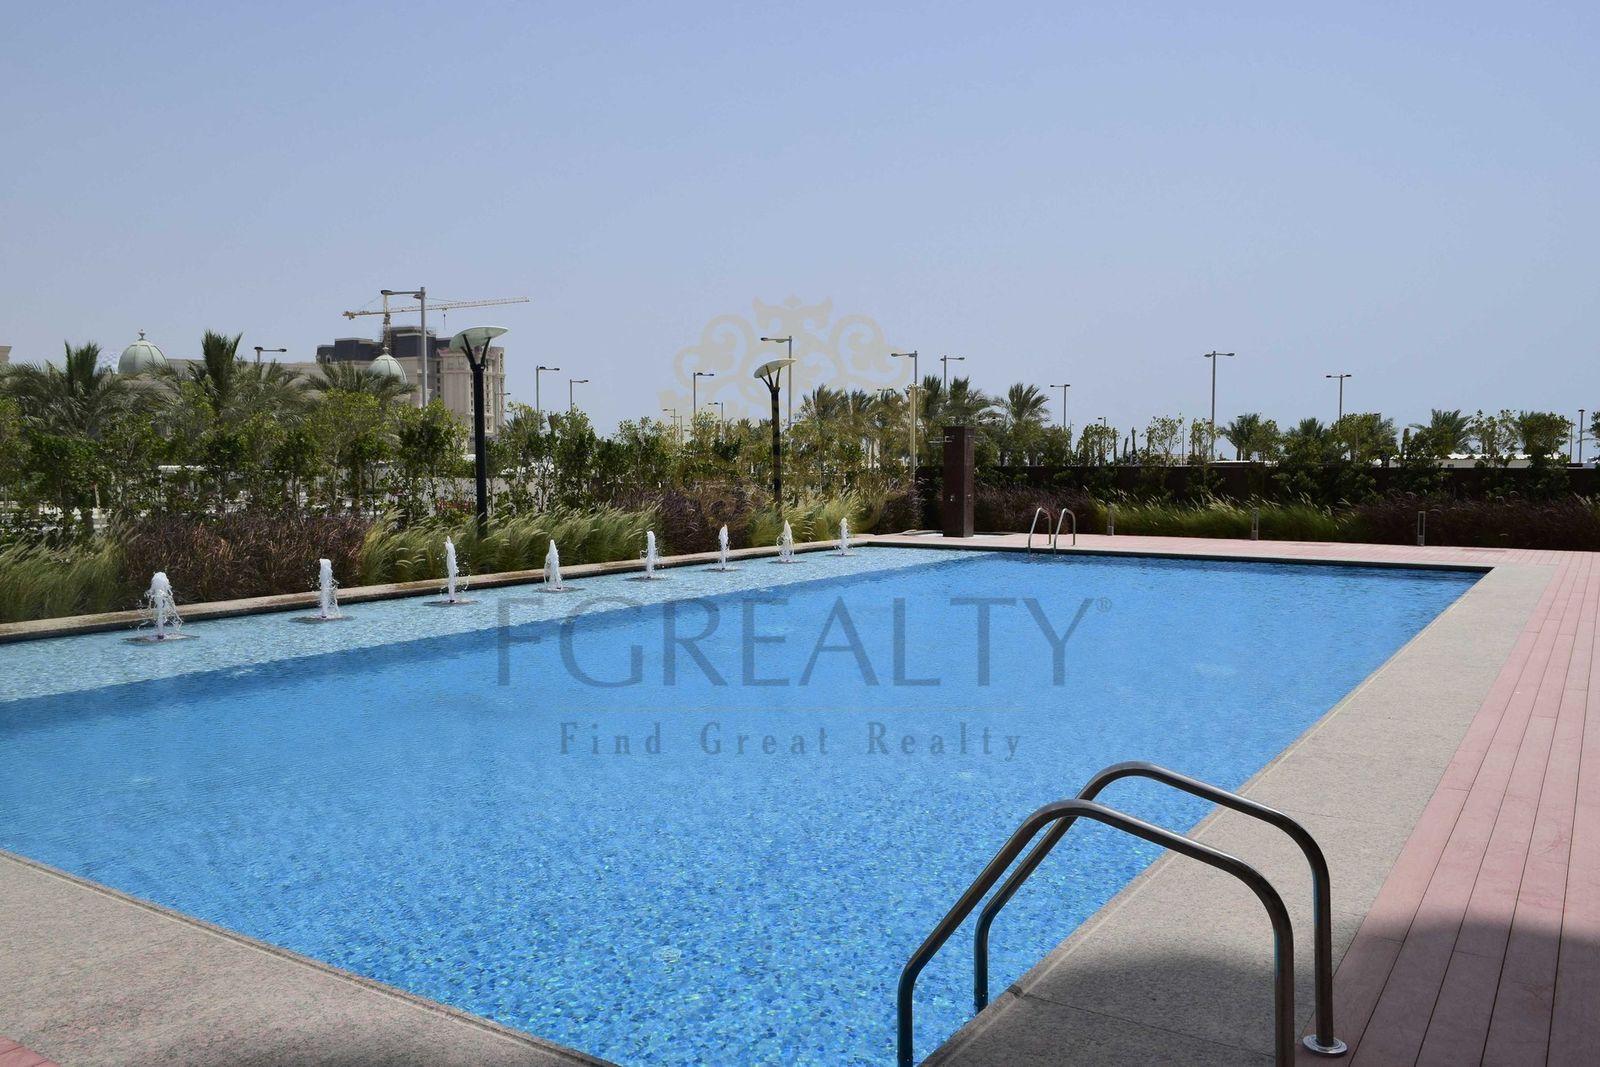 new homes - real estate company qatar